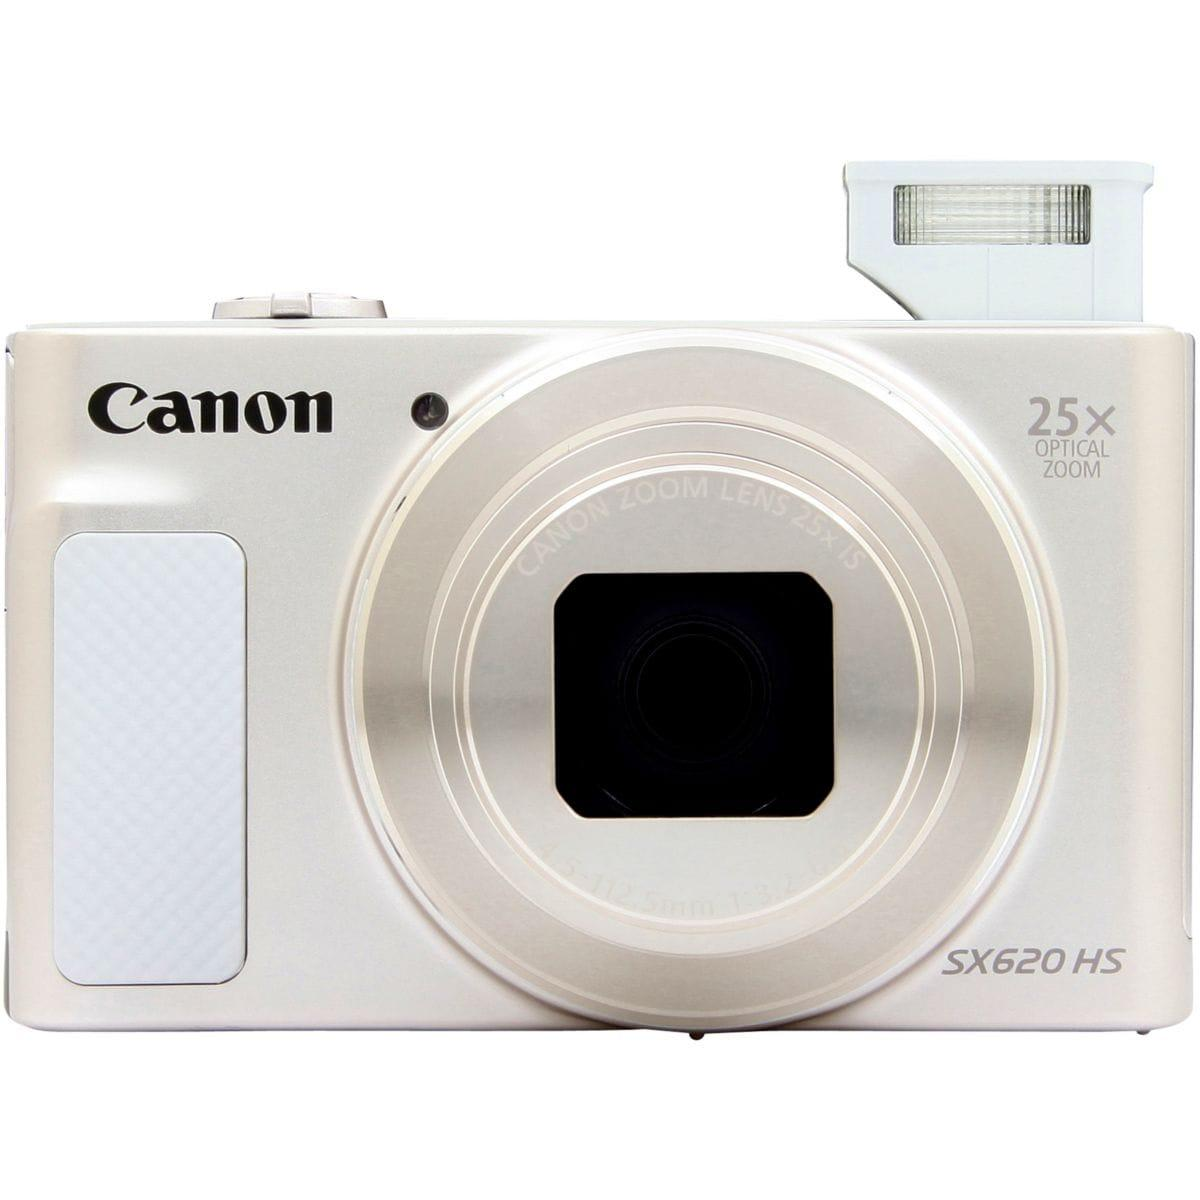 Compactcamera Canon PowerShot SX620 HS